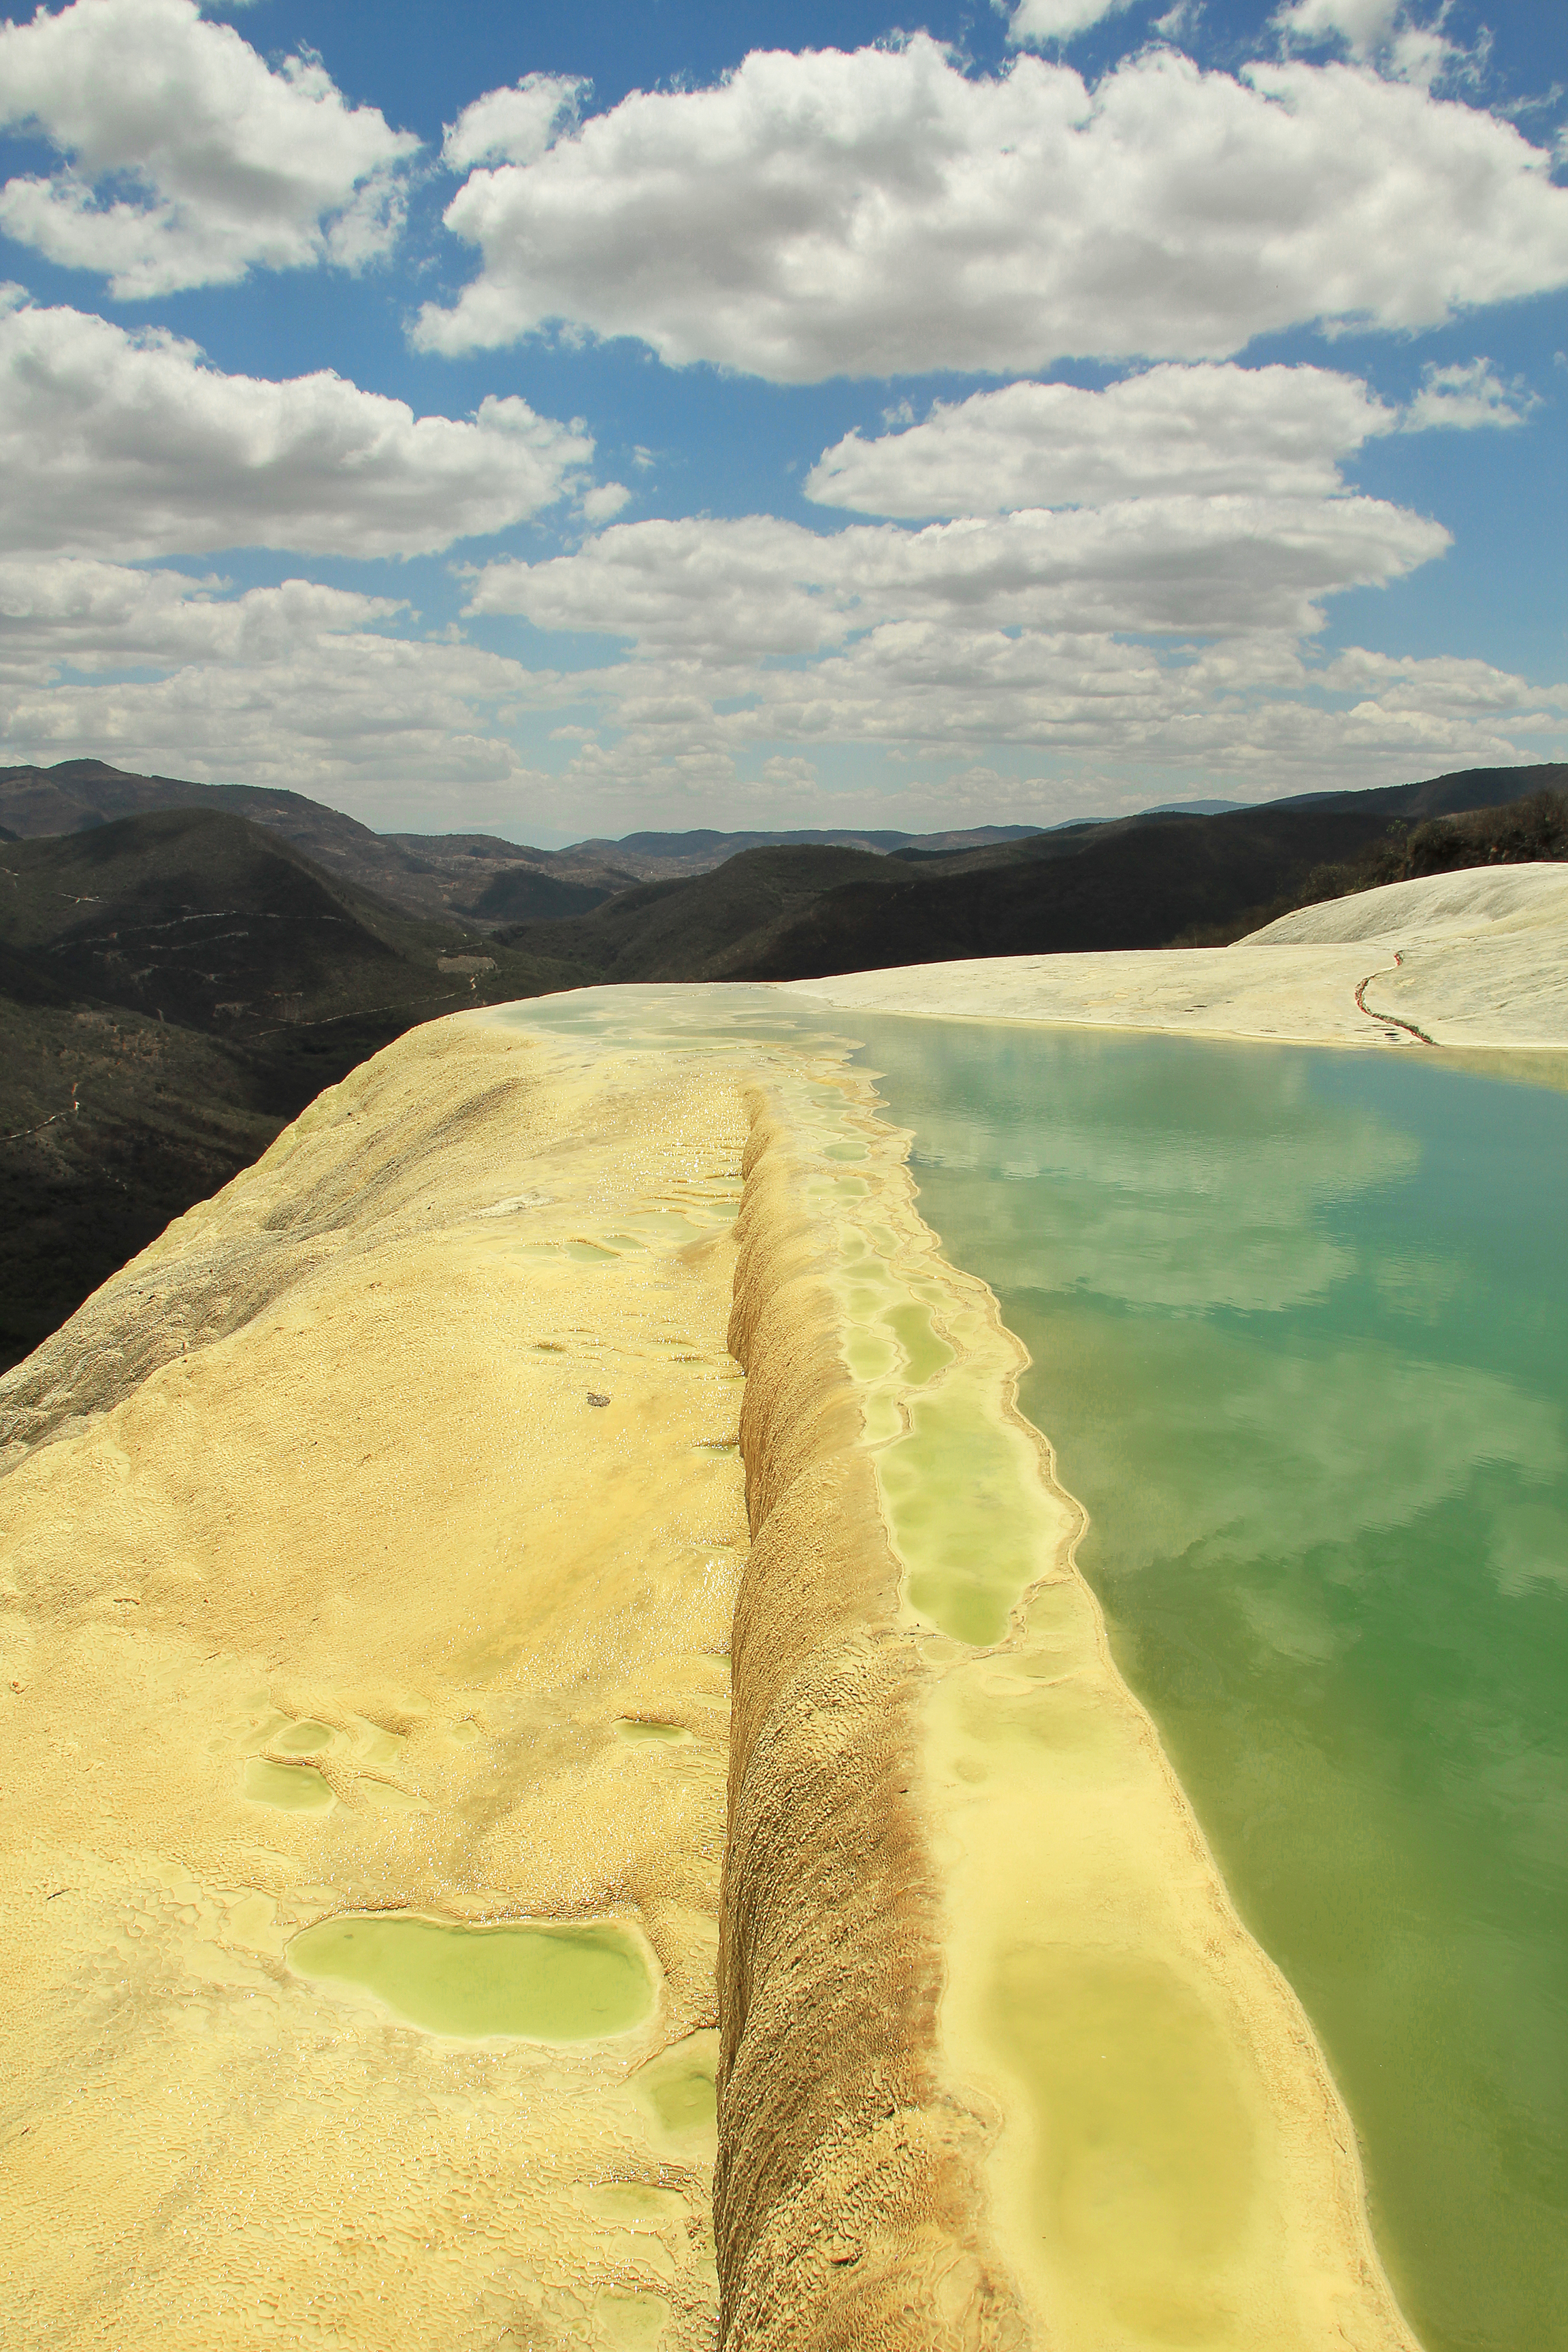 hierve-el-agua-2-oaxaca-mexico-sina-falk